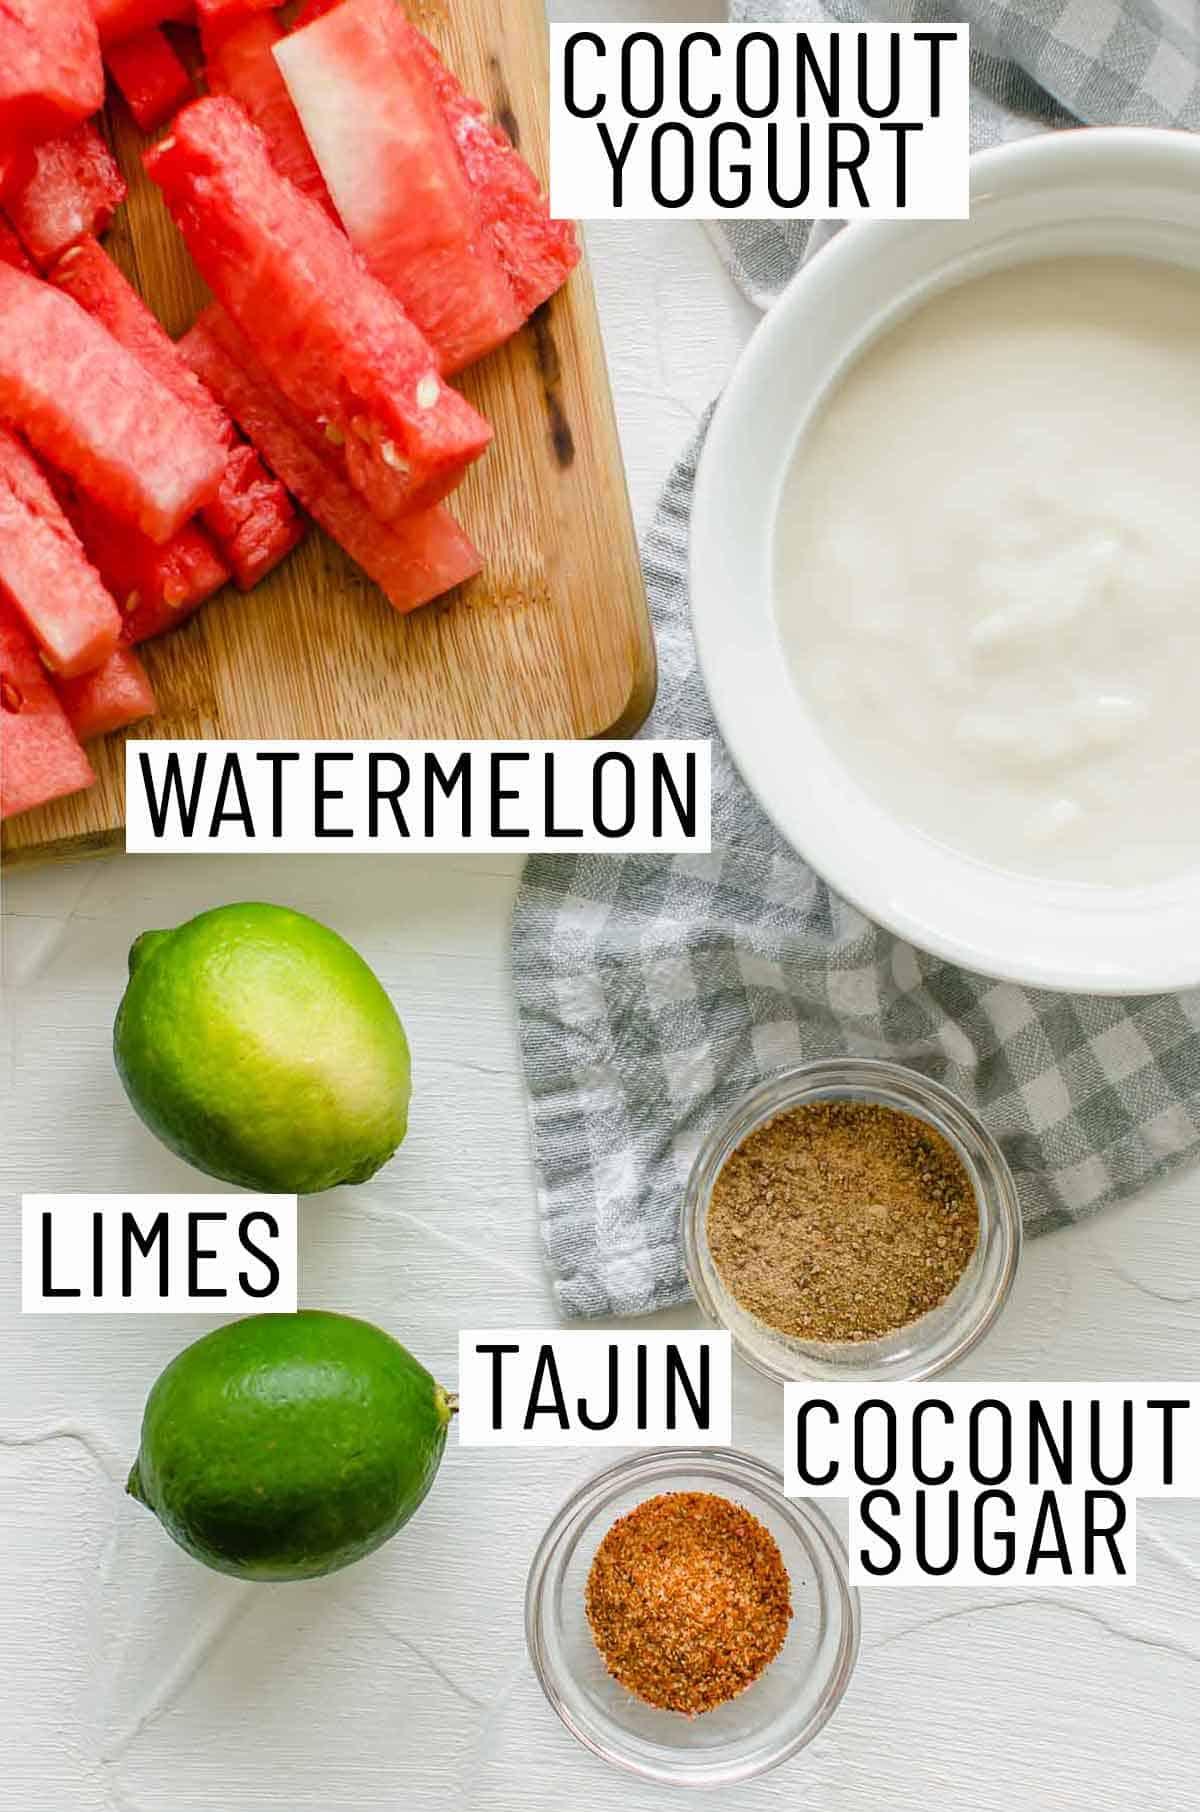 Ingredients needed to make watermelon fries.